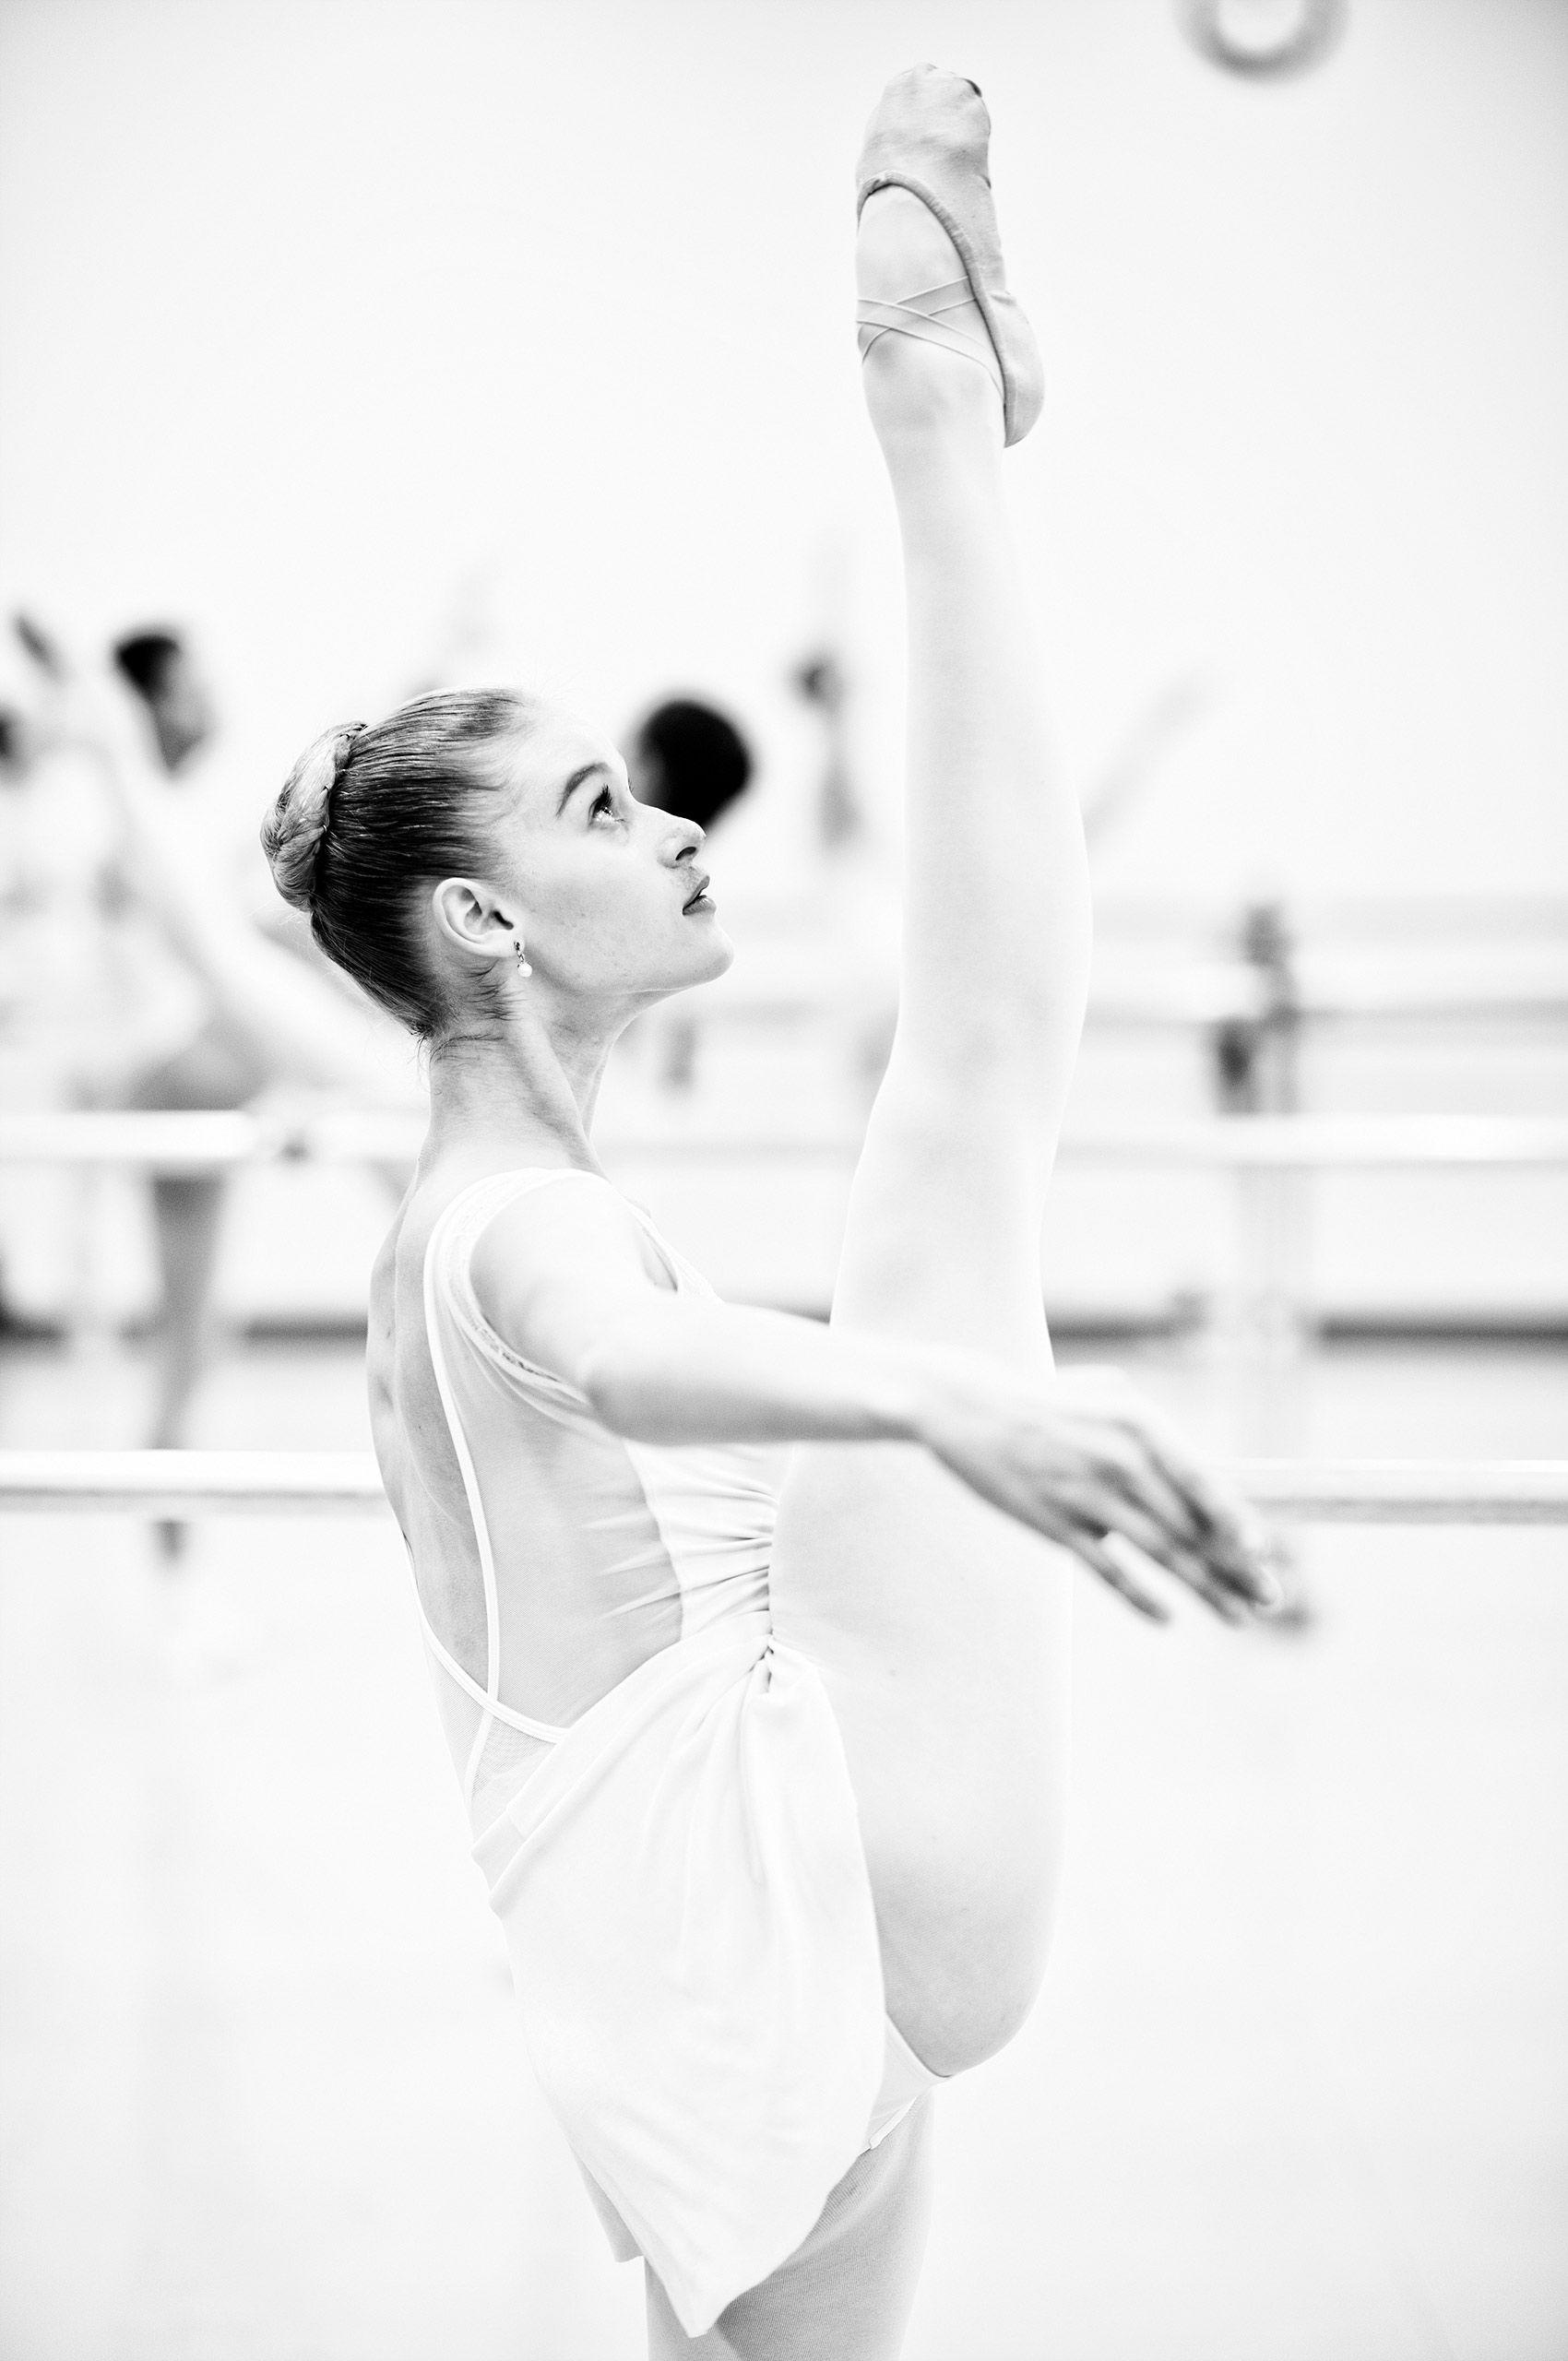 Ballet-practice-HenrikOlundPhotography.jpg